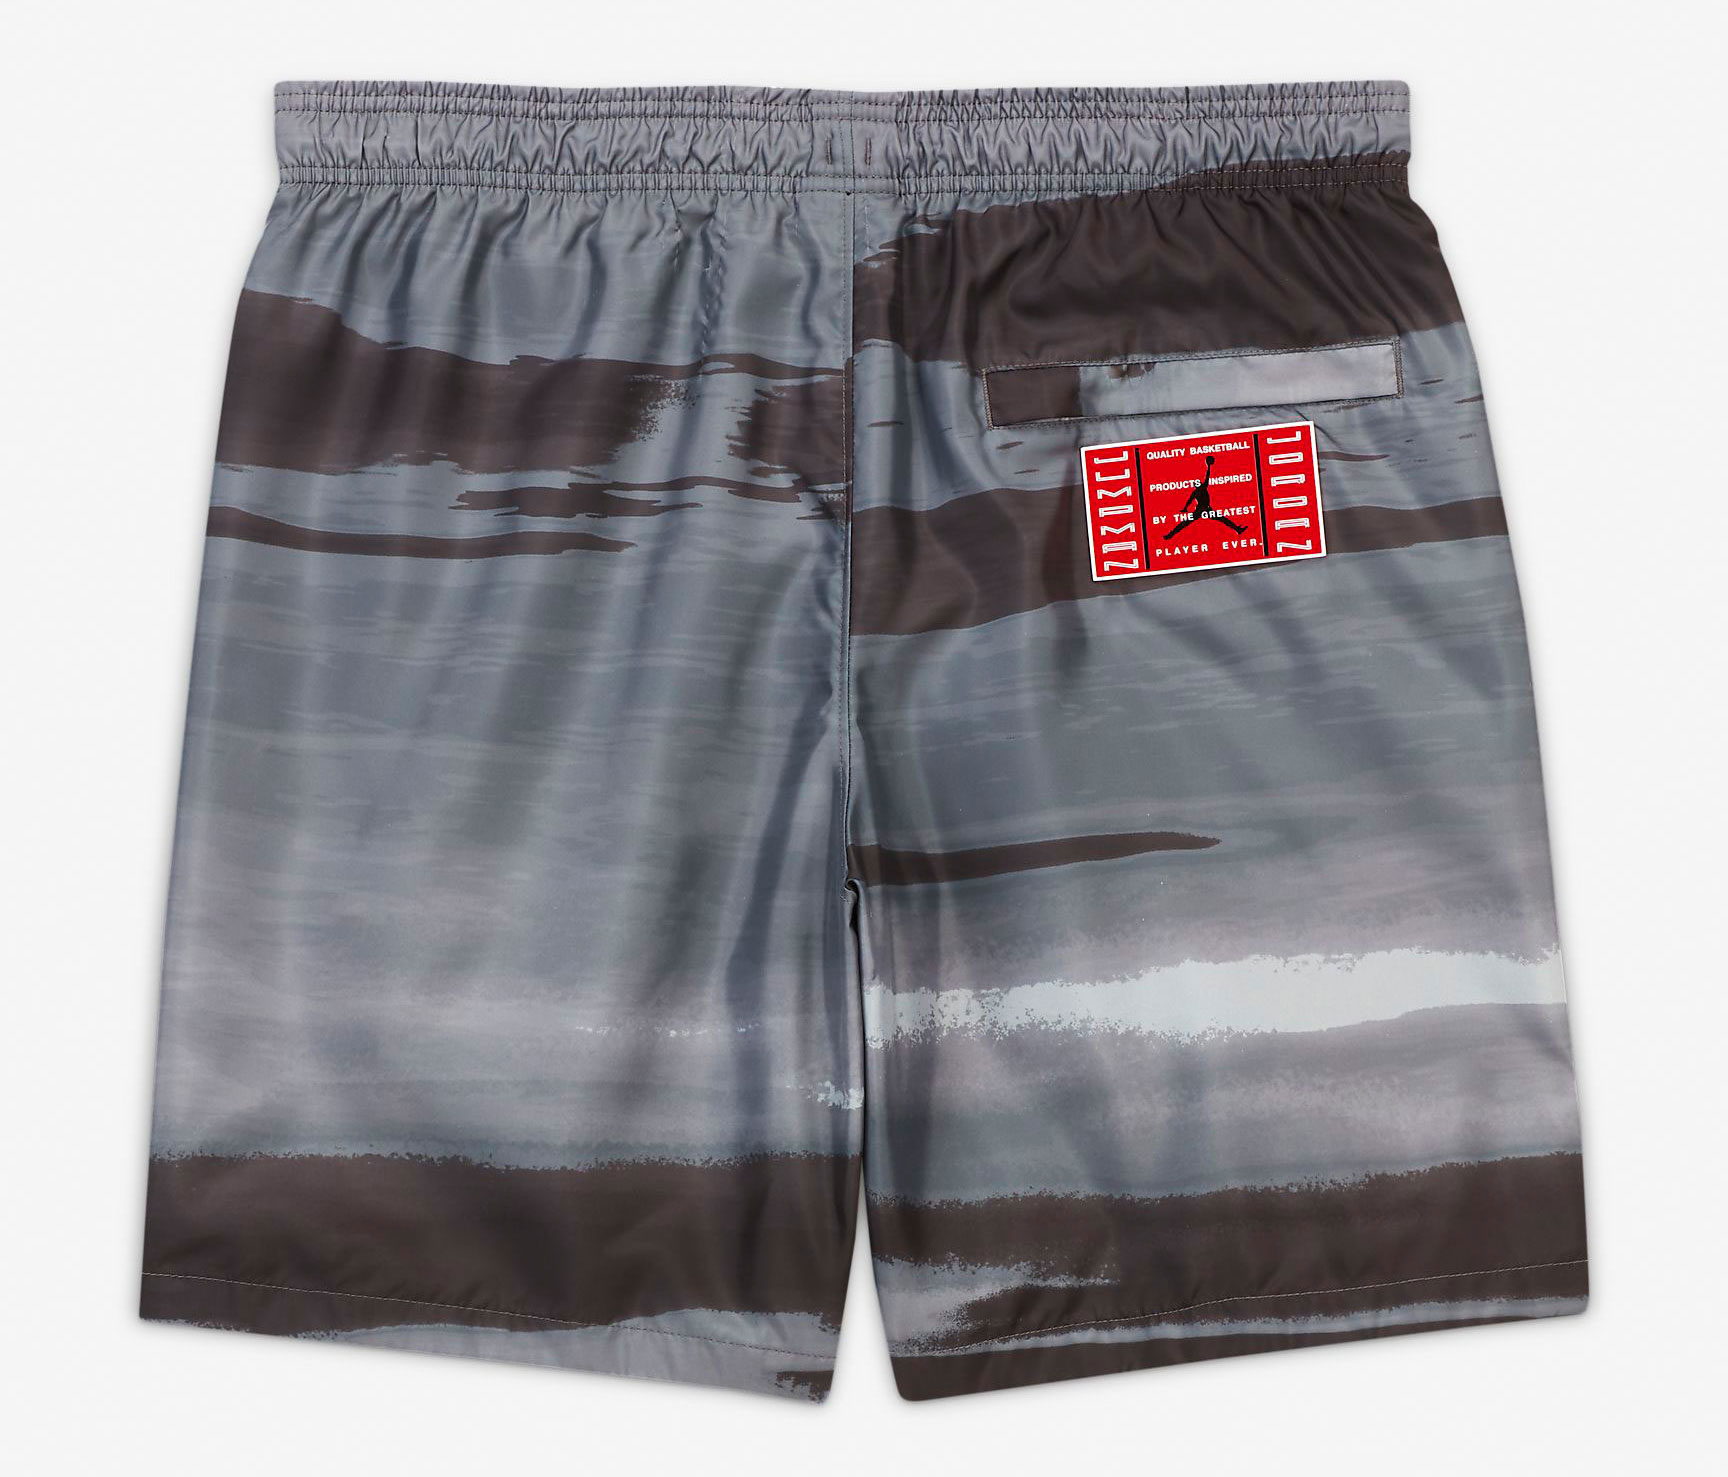 air-jordan-11-low-ie-black-cement-shorts-match-2